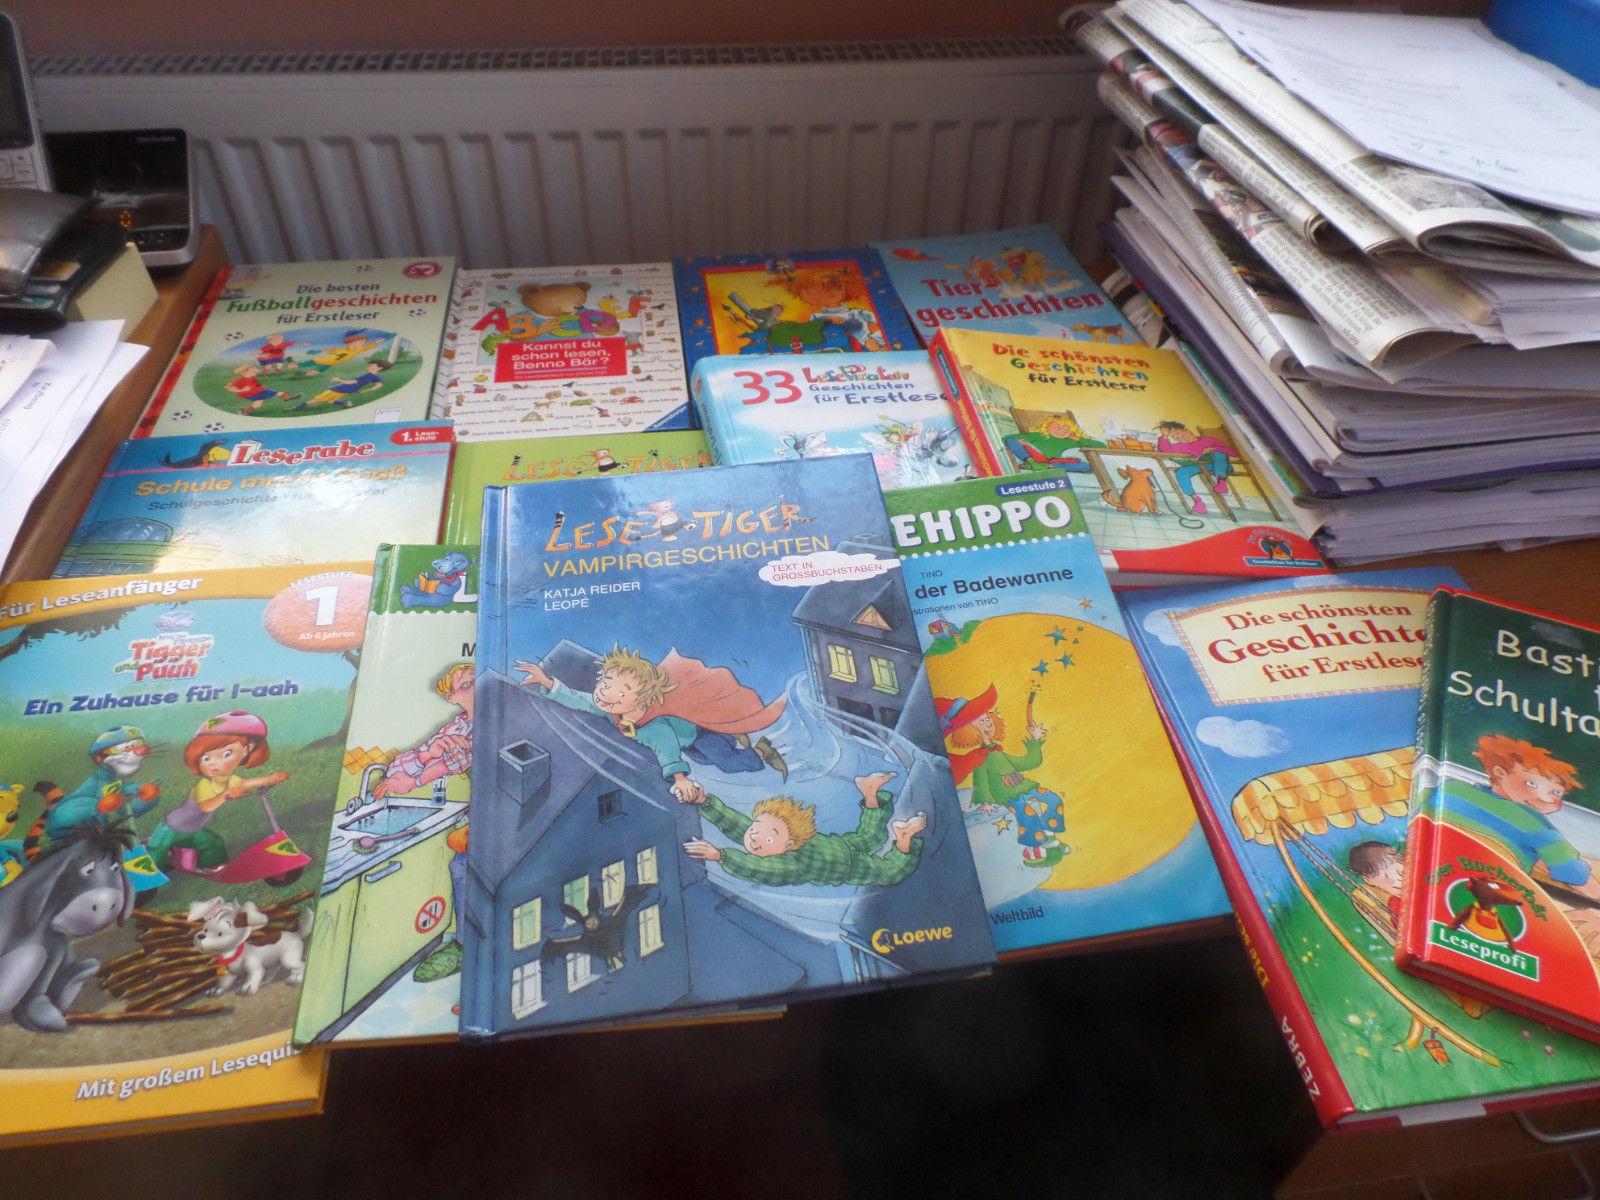 Paket Kinder Bücher Lesetiger Lesepiraten Lesehippo Lesestufe 1/2 14 Bücher